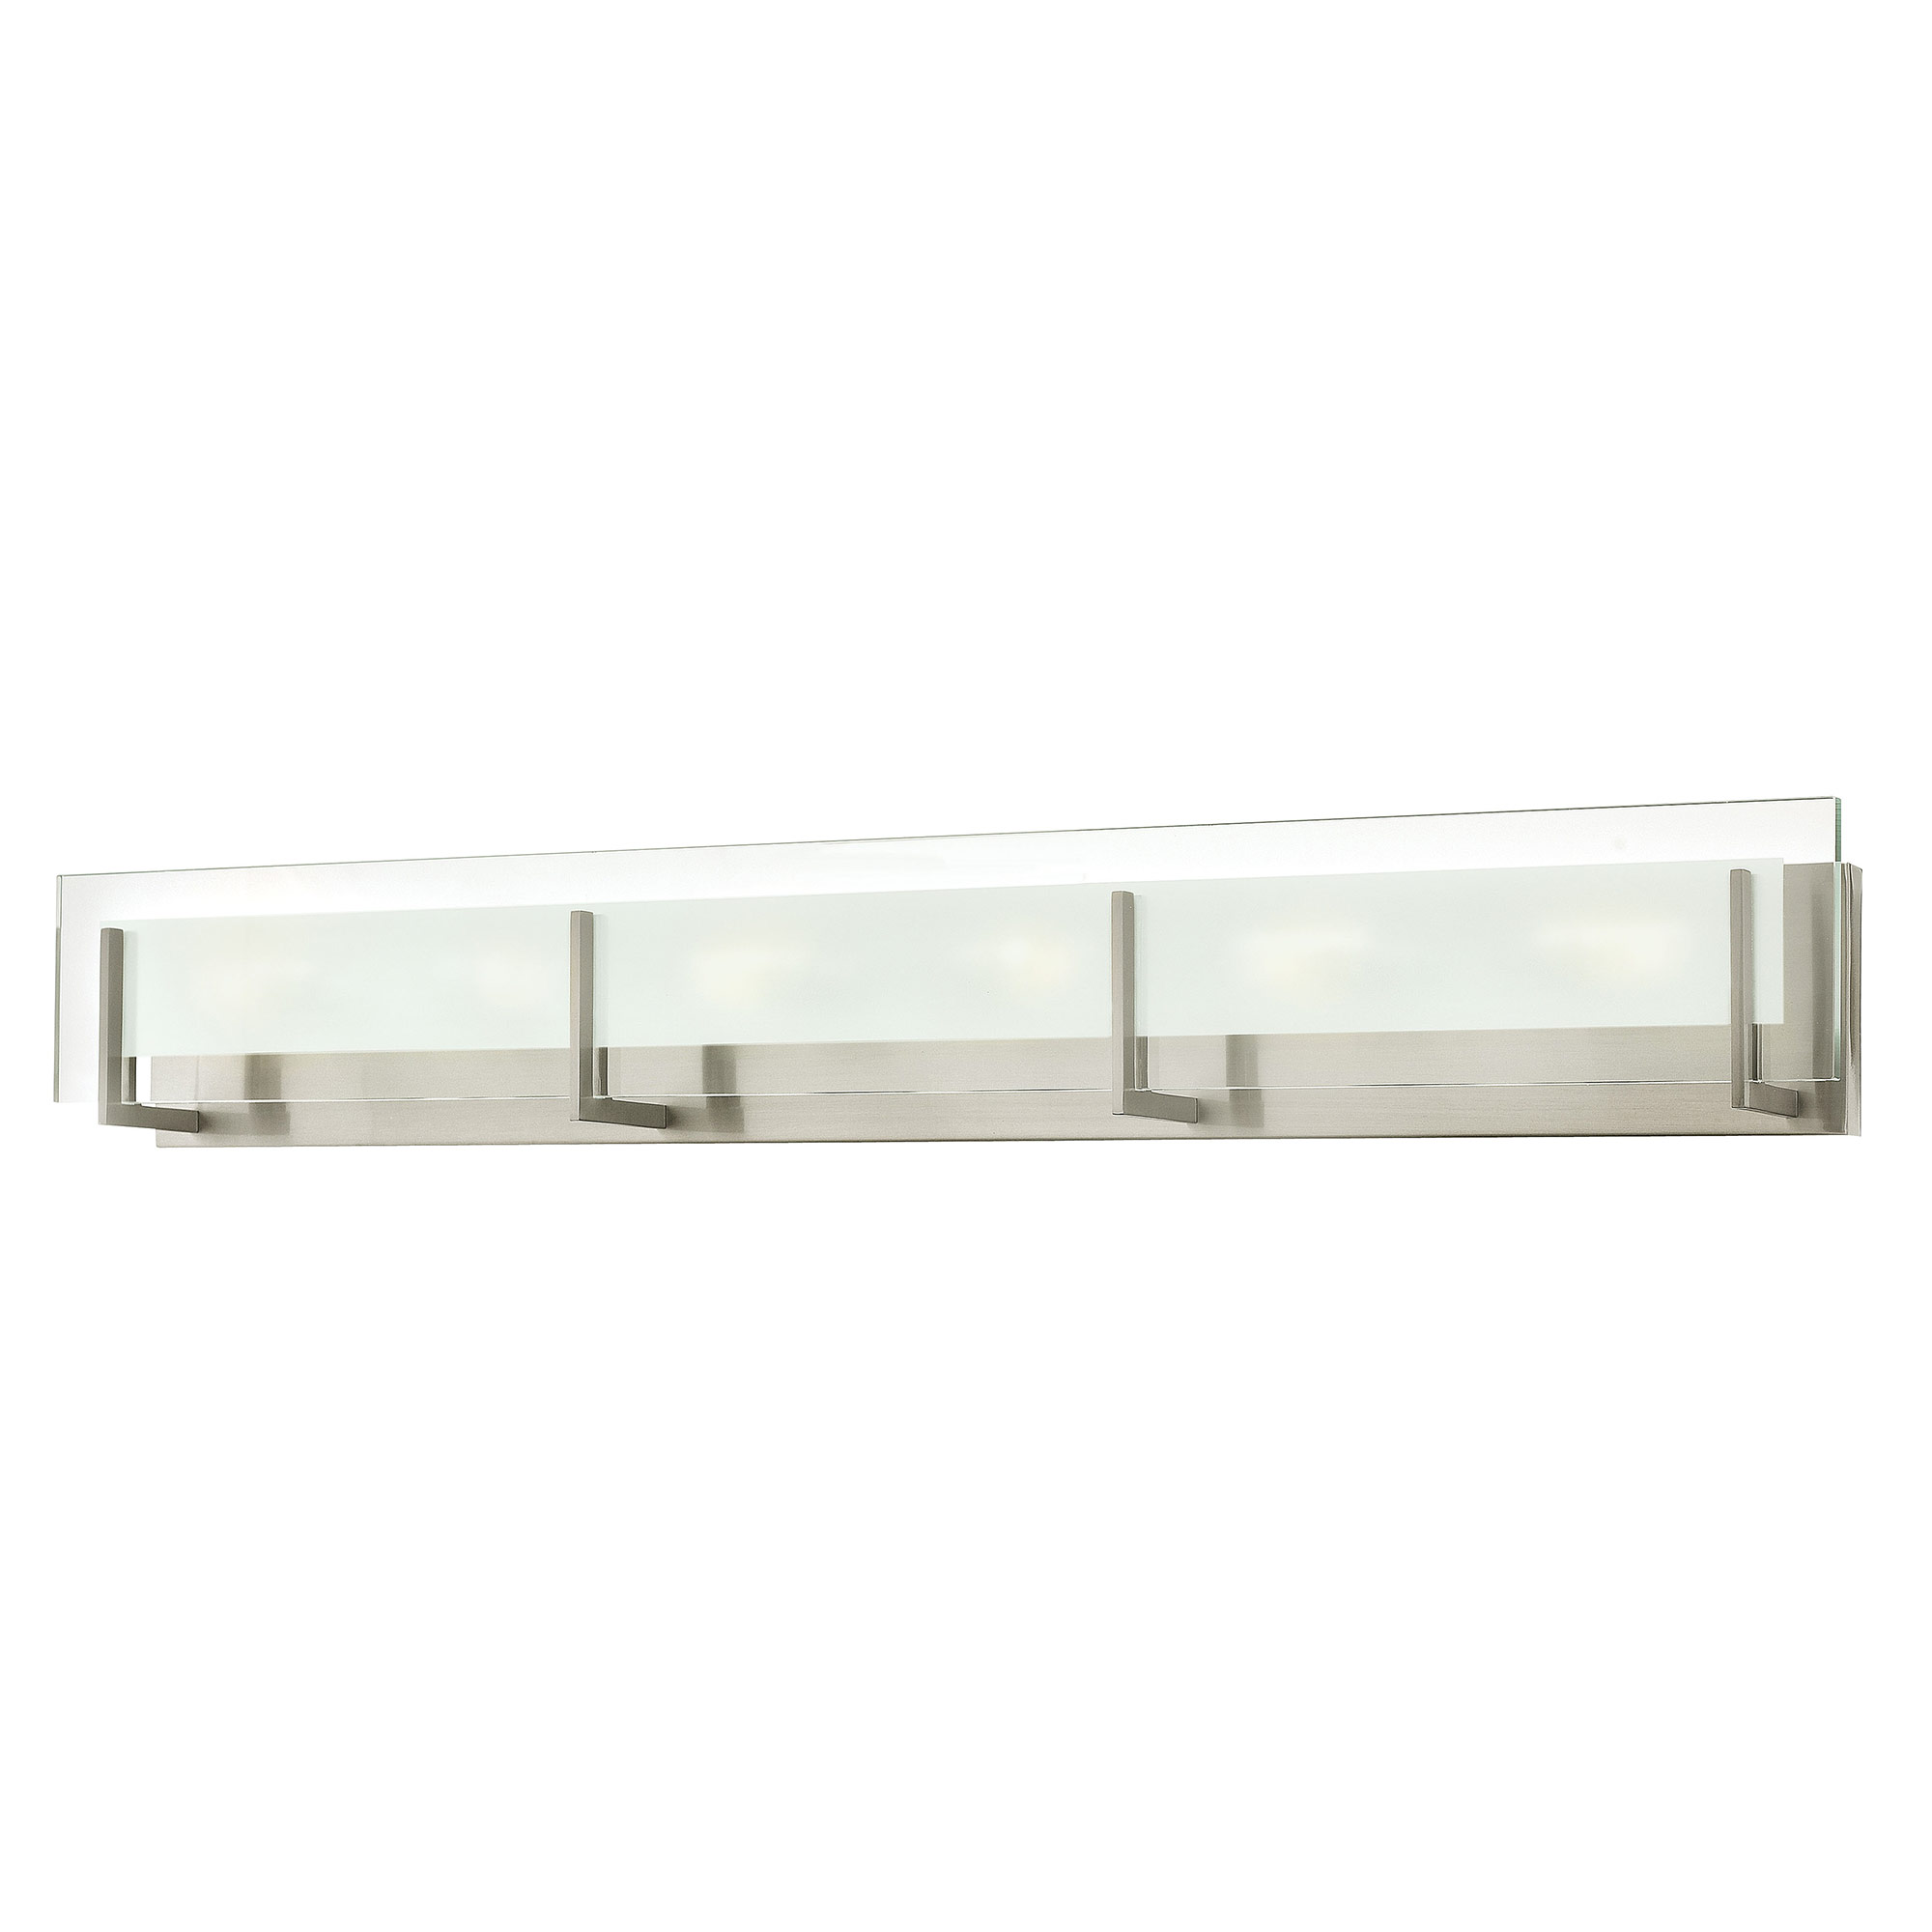 Latitude Bathroom Vanity Light By Hinkley Lighting 5656BN